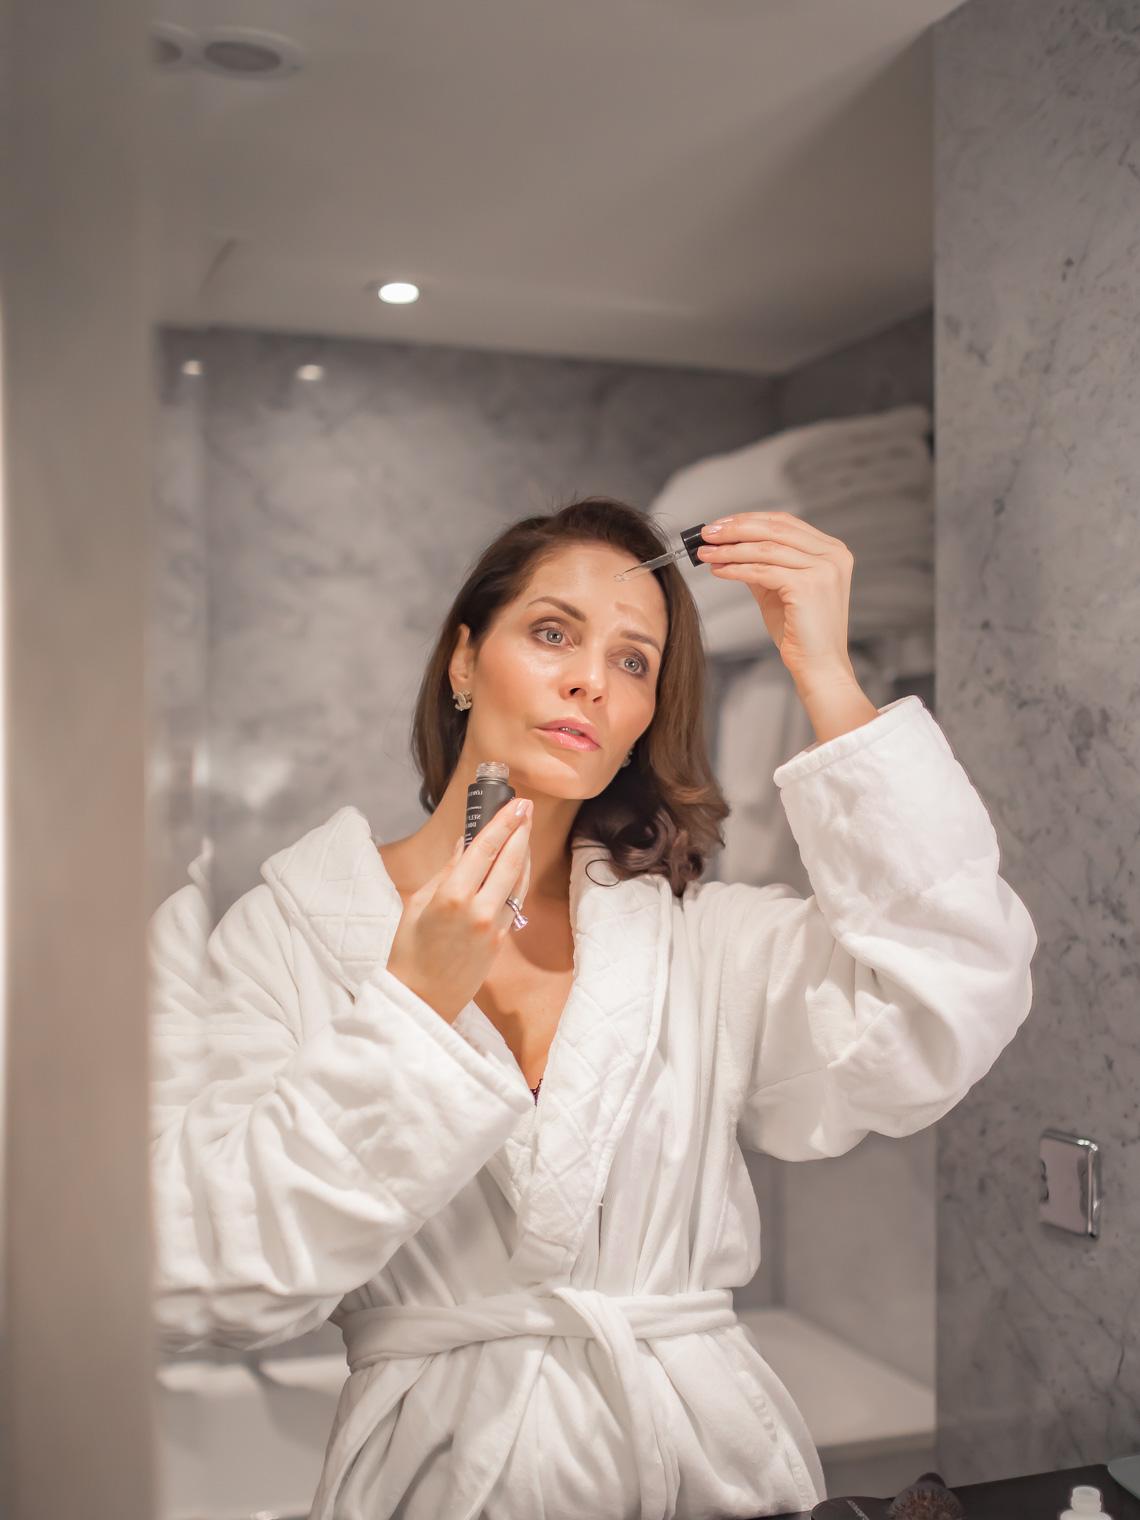 Lowengrip self tan drop for face, applying self tanning drops